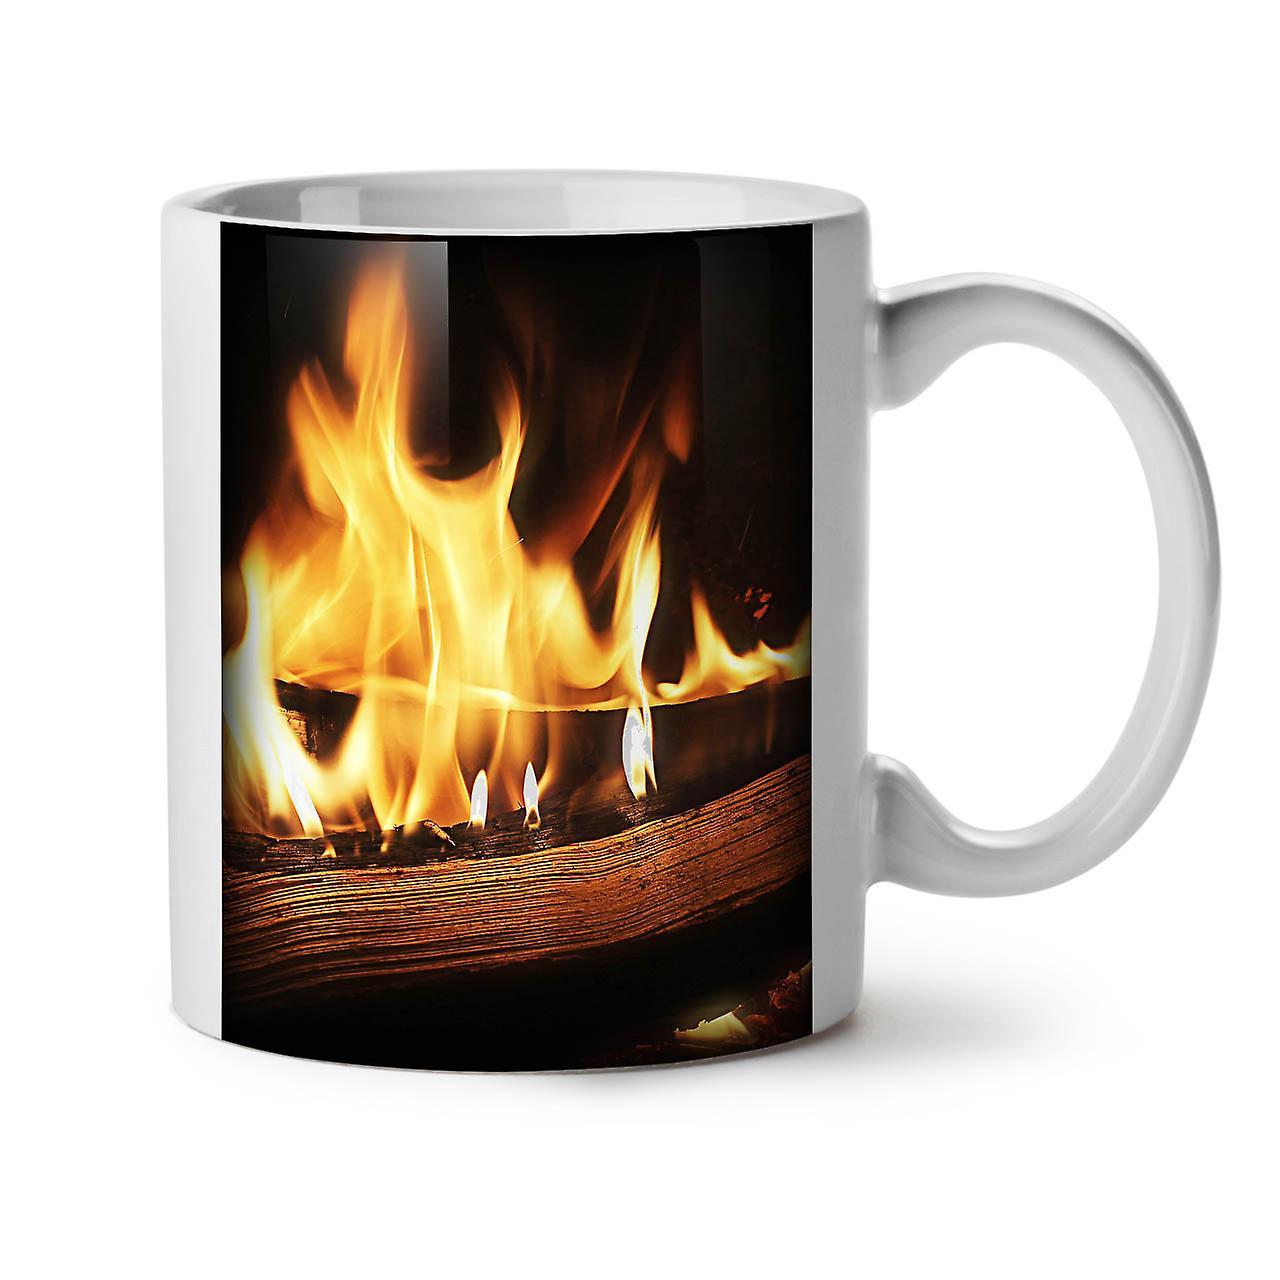 Café Burning OzWellcoda Feu Thé Céramique Livre Blanc 11 Nouveau Tasse reCxBoQdW